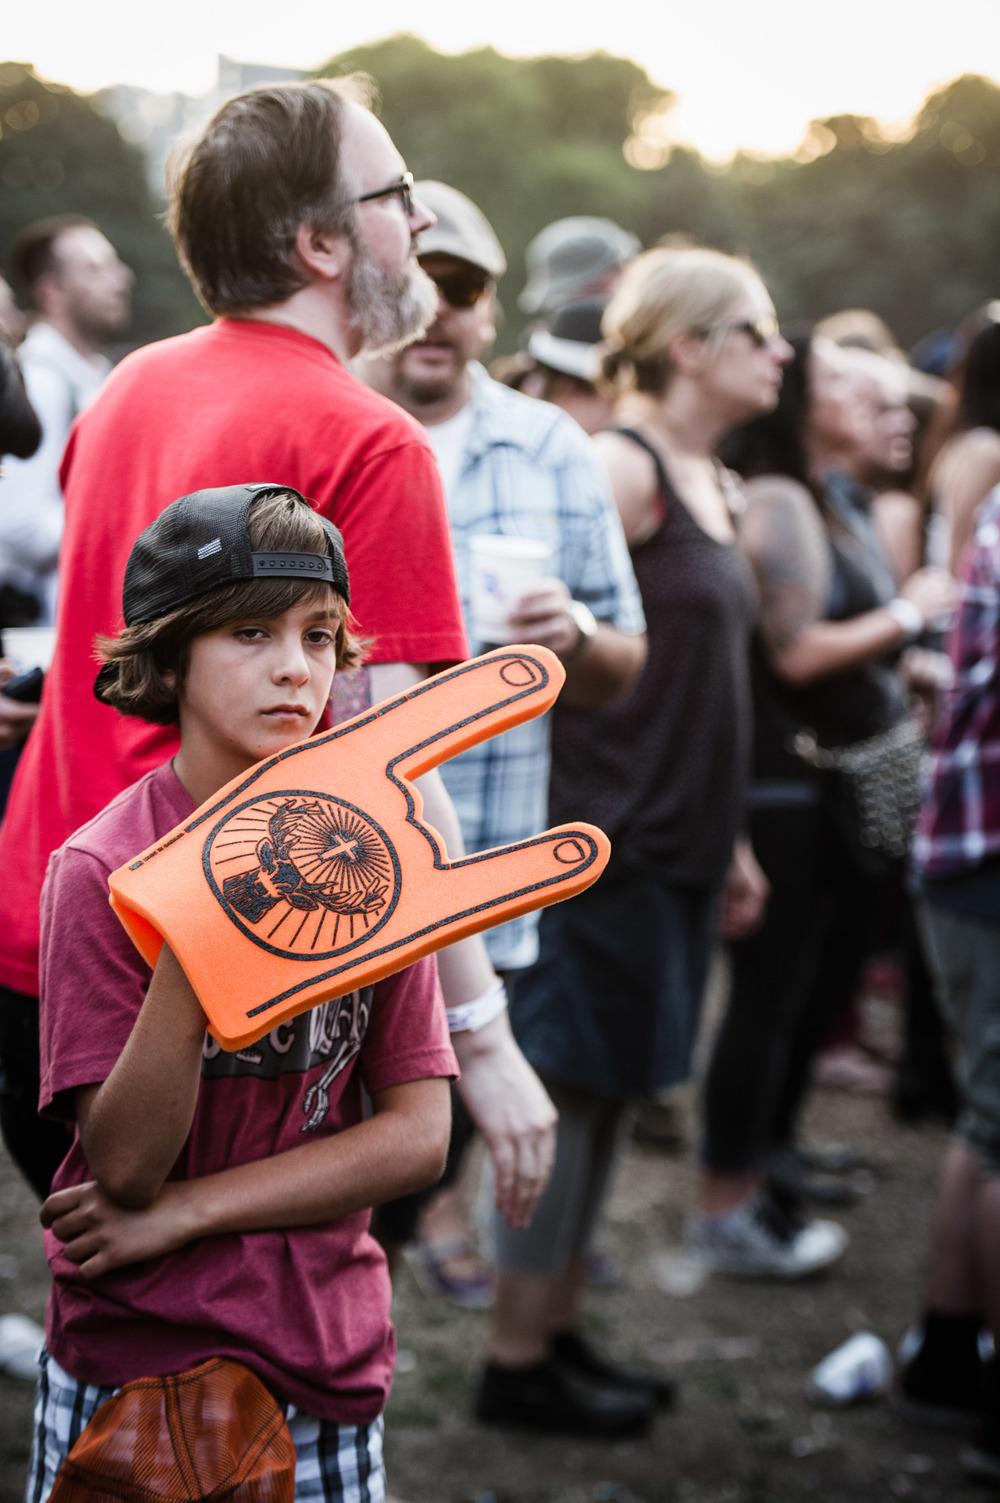 Concert Riot Fest August 2013-773.jpg